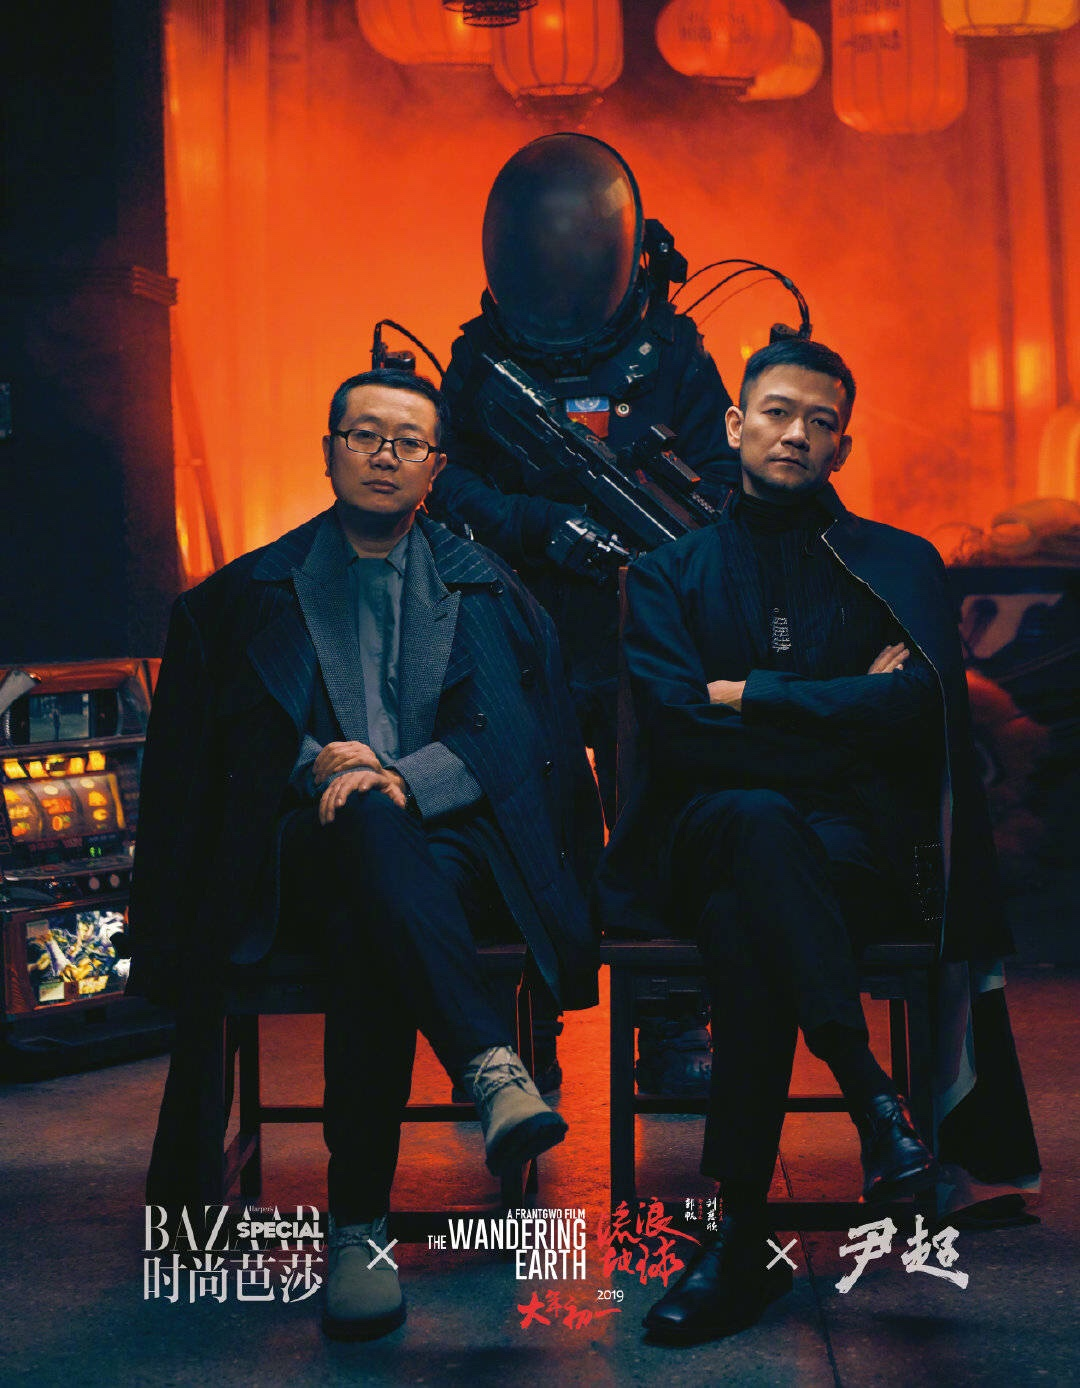 Movie Poster 4 Chinese film CHANG Ka.China.Tsui Wei Ouyang Hung-Ying.Decor art.